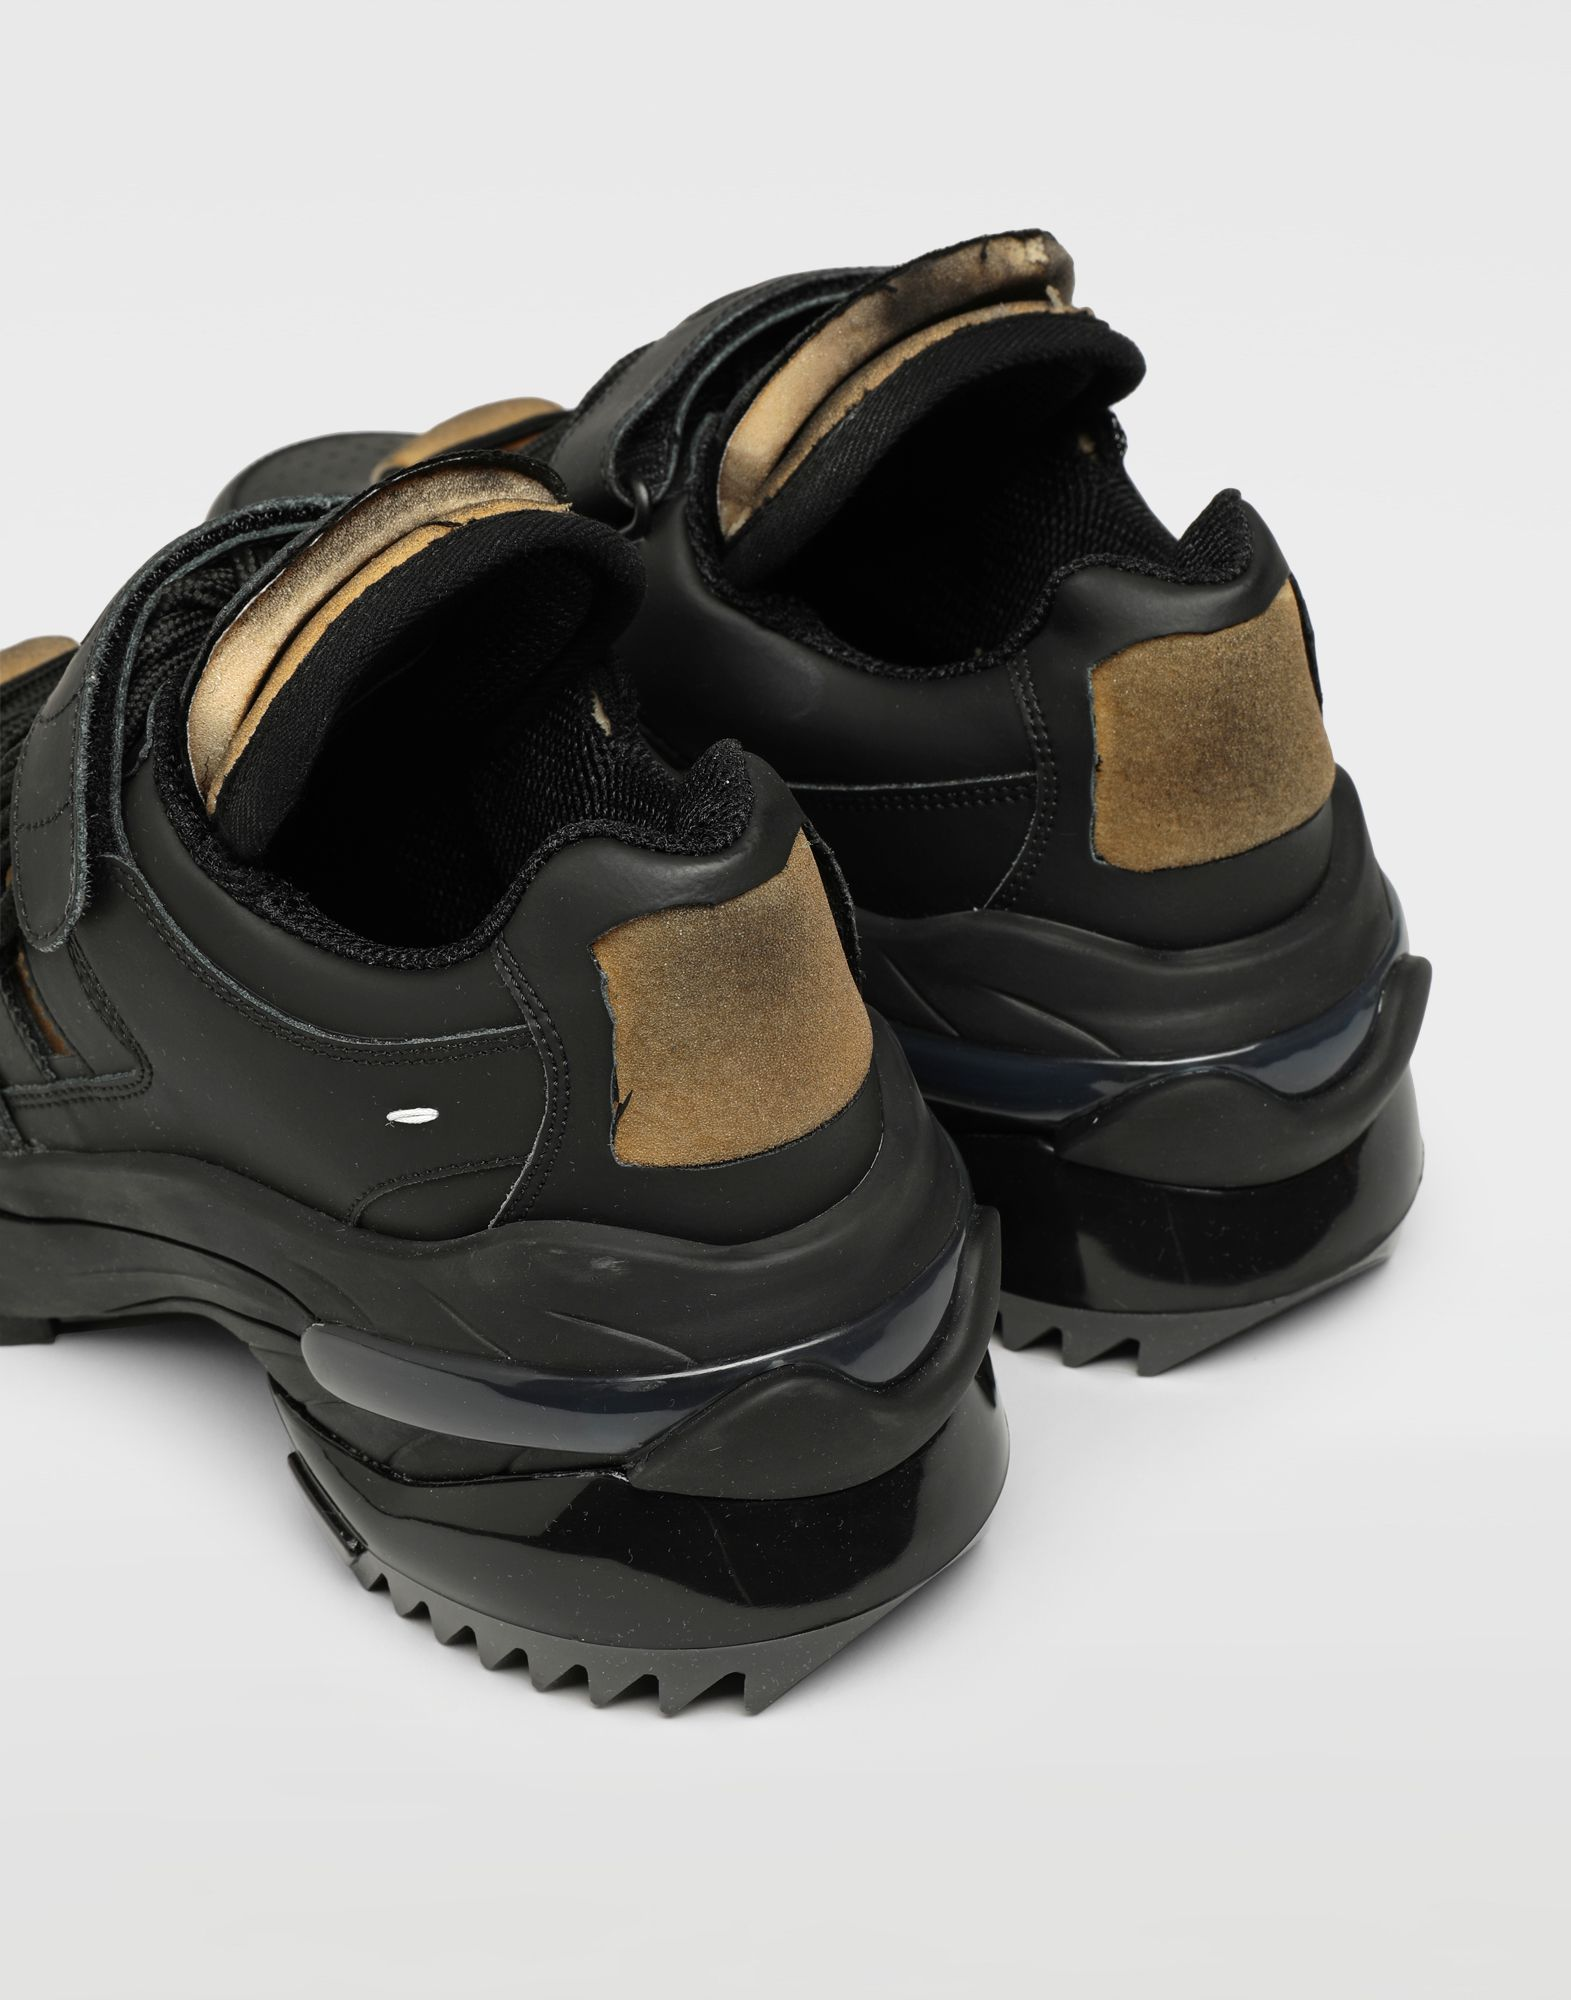 MAISON MARGIELA Lowtop-Sneakers Retro Fit Sneakers Herr e